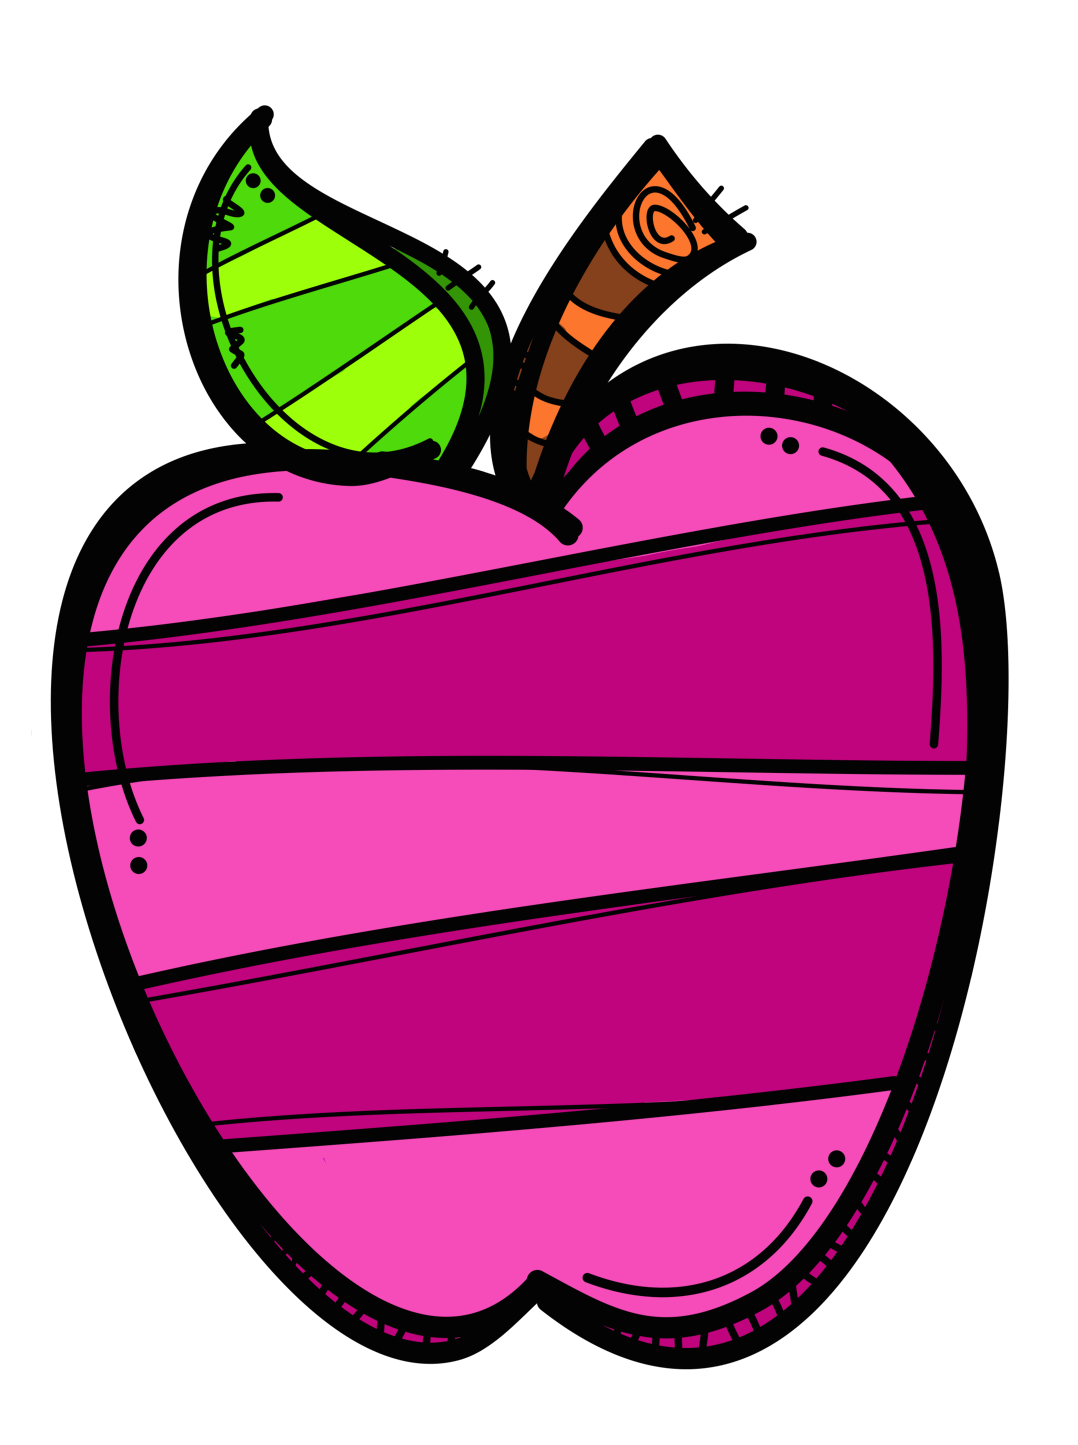 Apple school clipart vector free download ✿*UY..QUE TE COMO*✿*   MelonHeadz   Pinterest   Clip art, Clipart ... vector free download